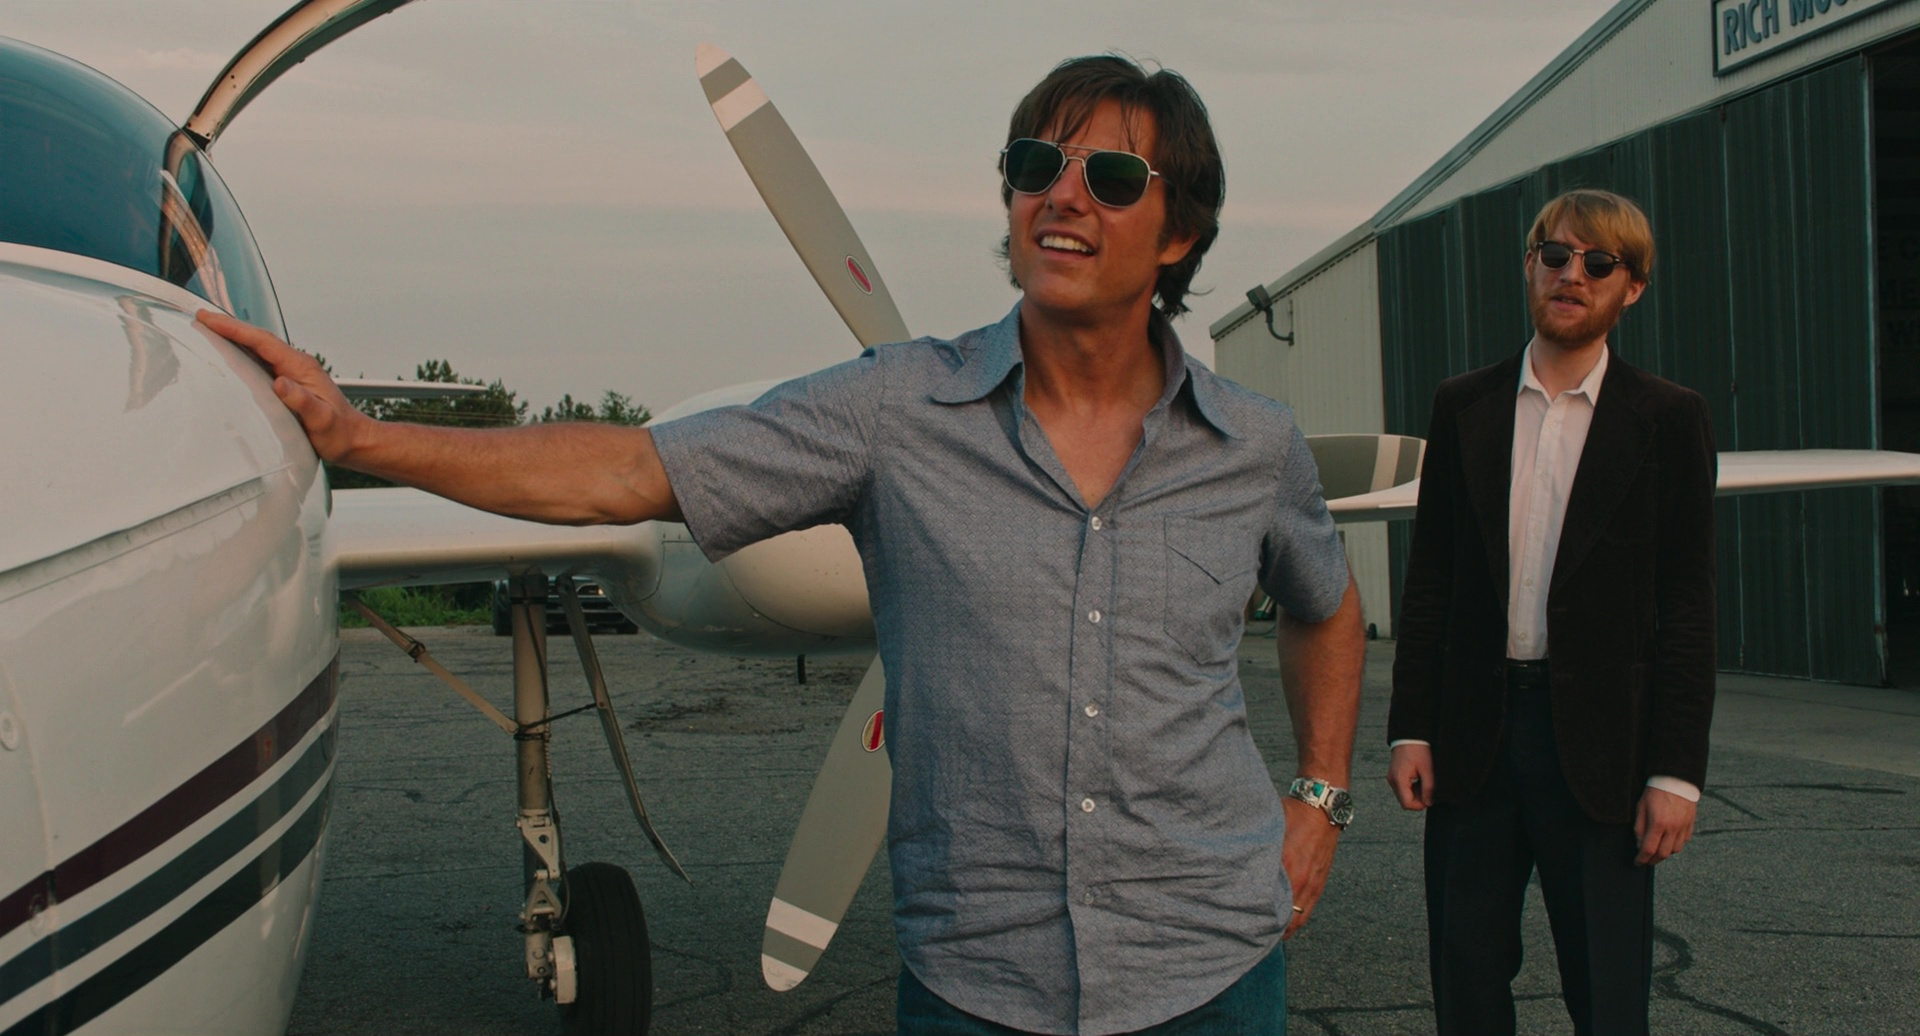 Randolph Engineering Aviator Bright Chrome Sunglasses Worn